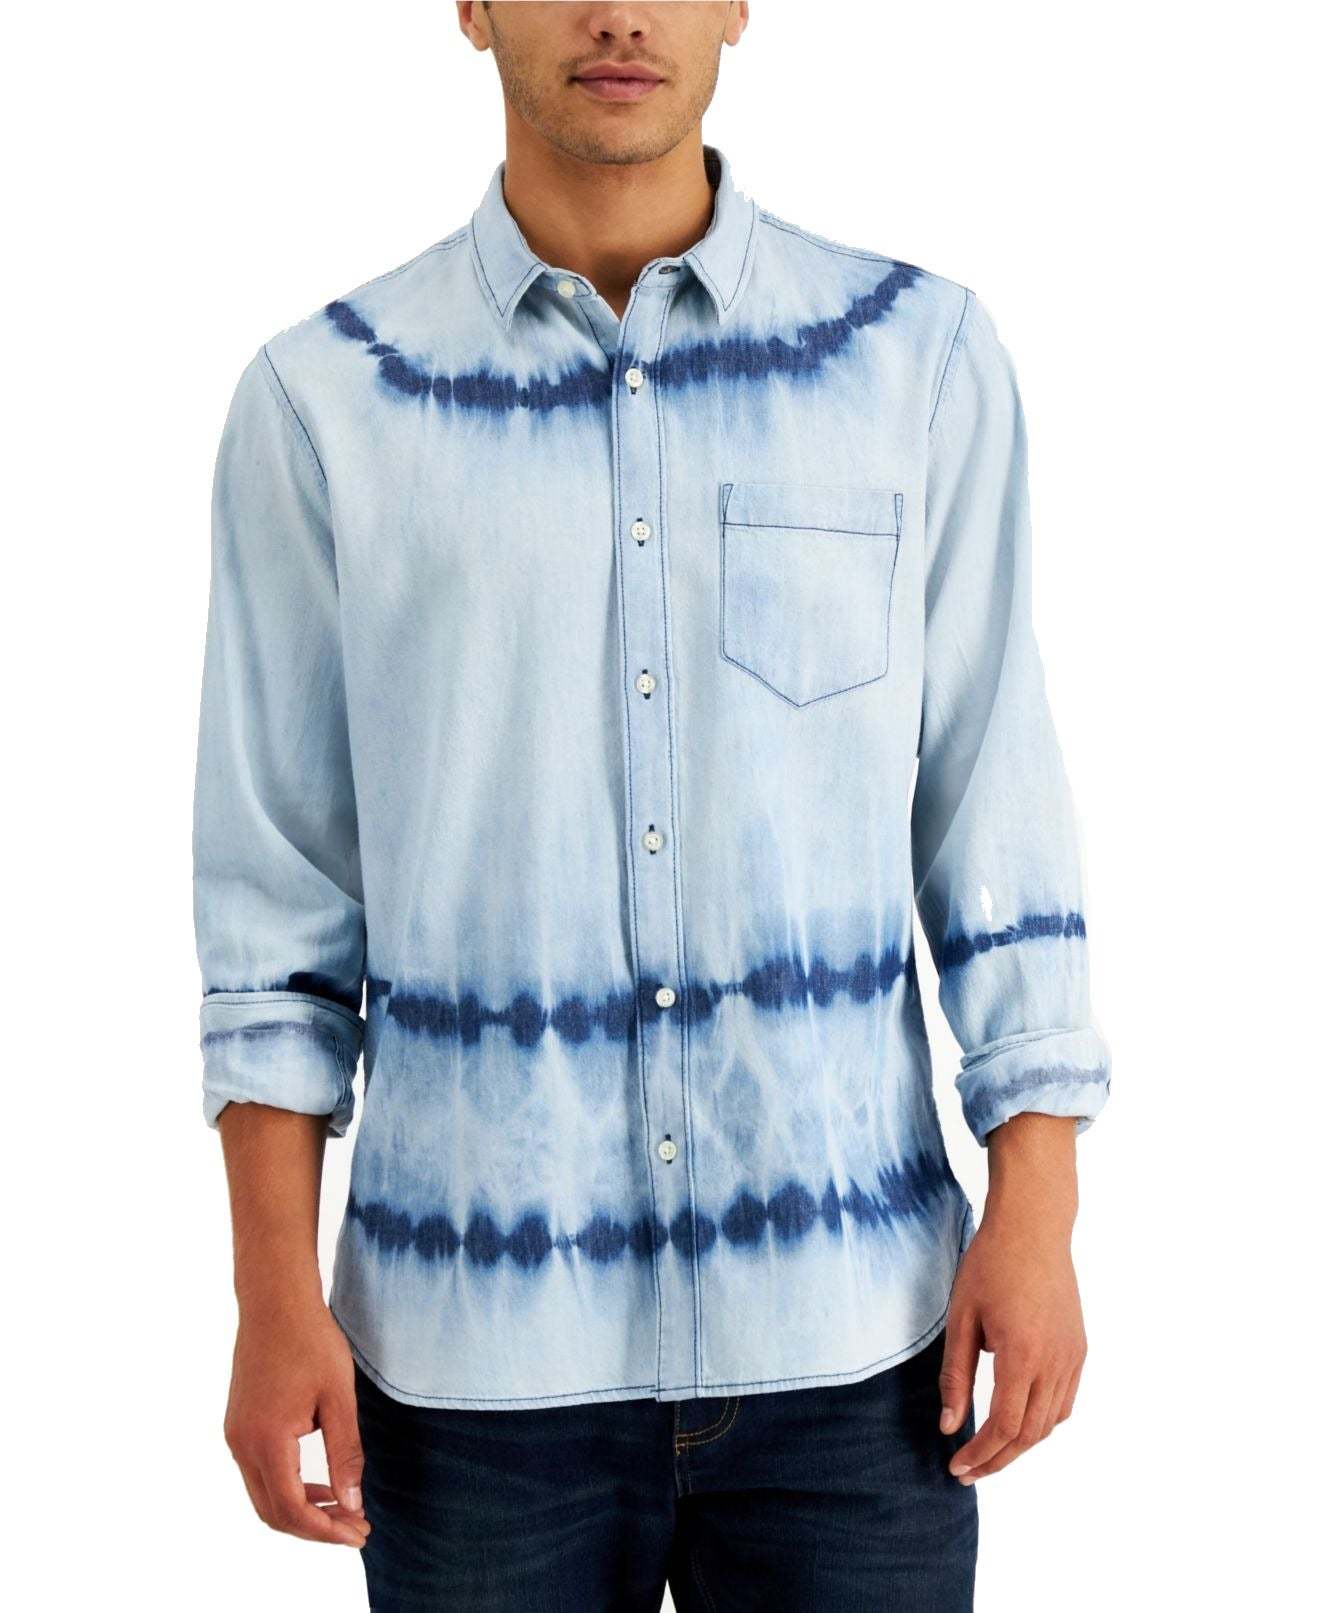 Sun + Stone Mens Shirt Blue Size Large L Tie Dye Stripe Button Up